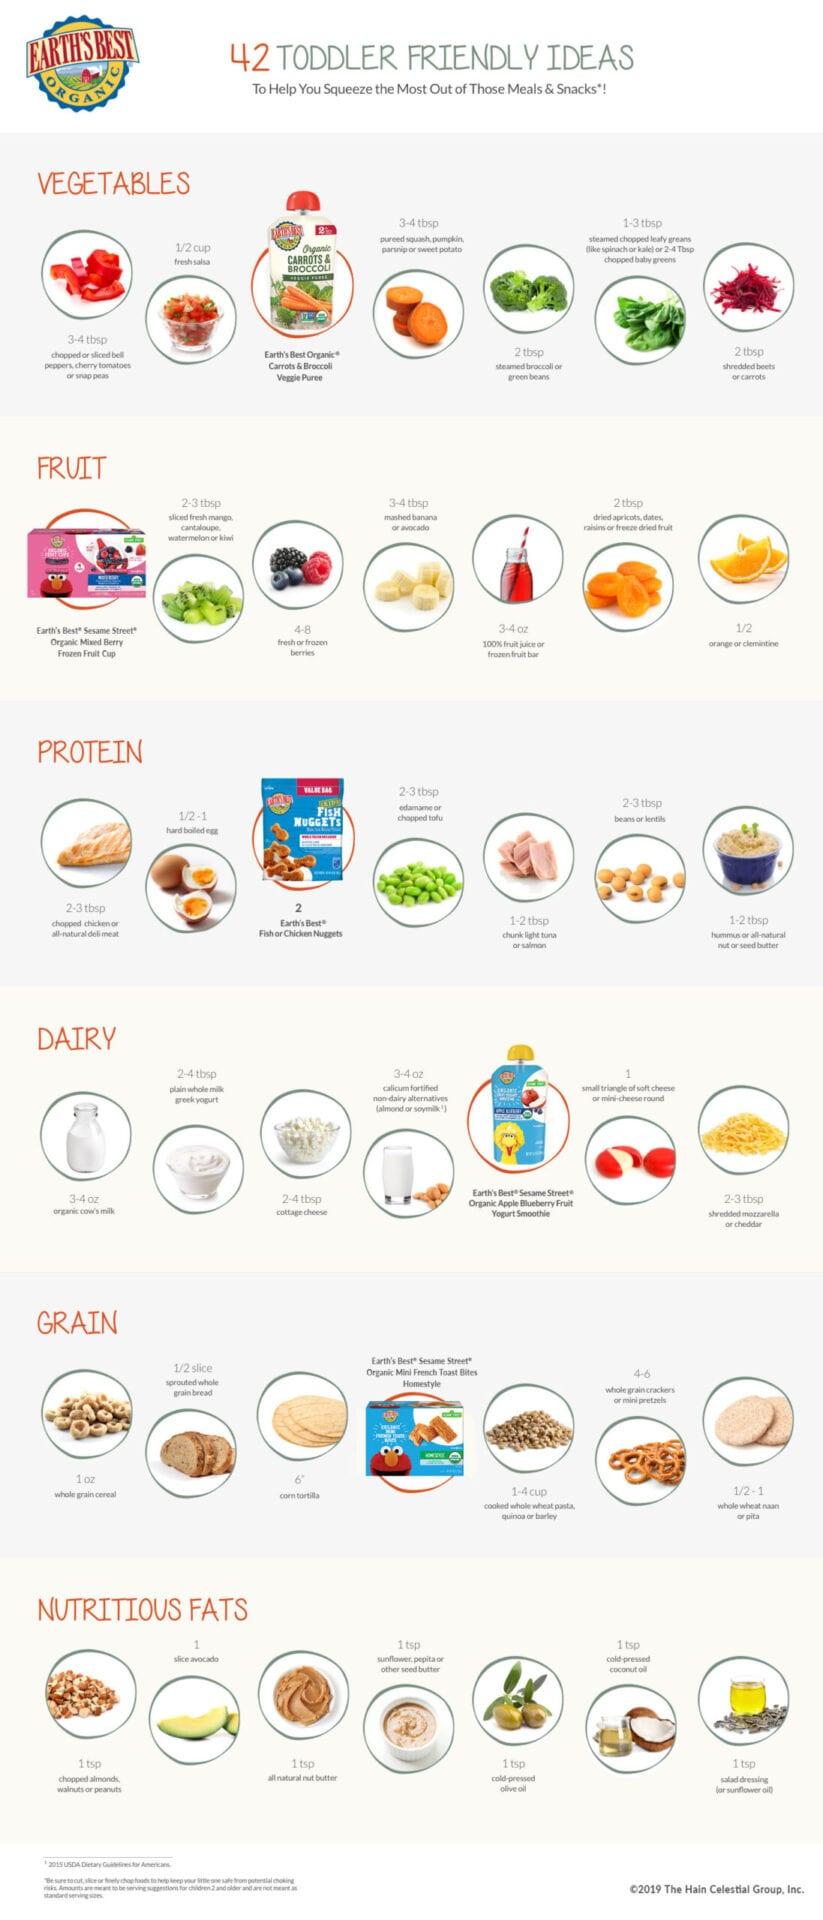 42 Toddler Friendly Ideas